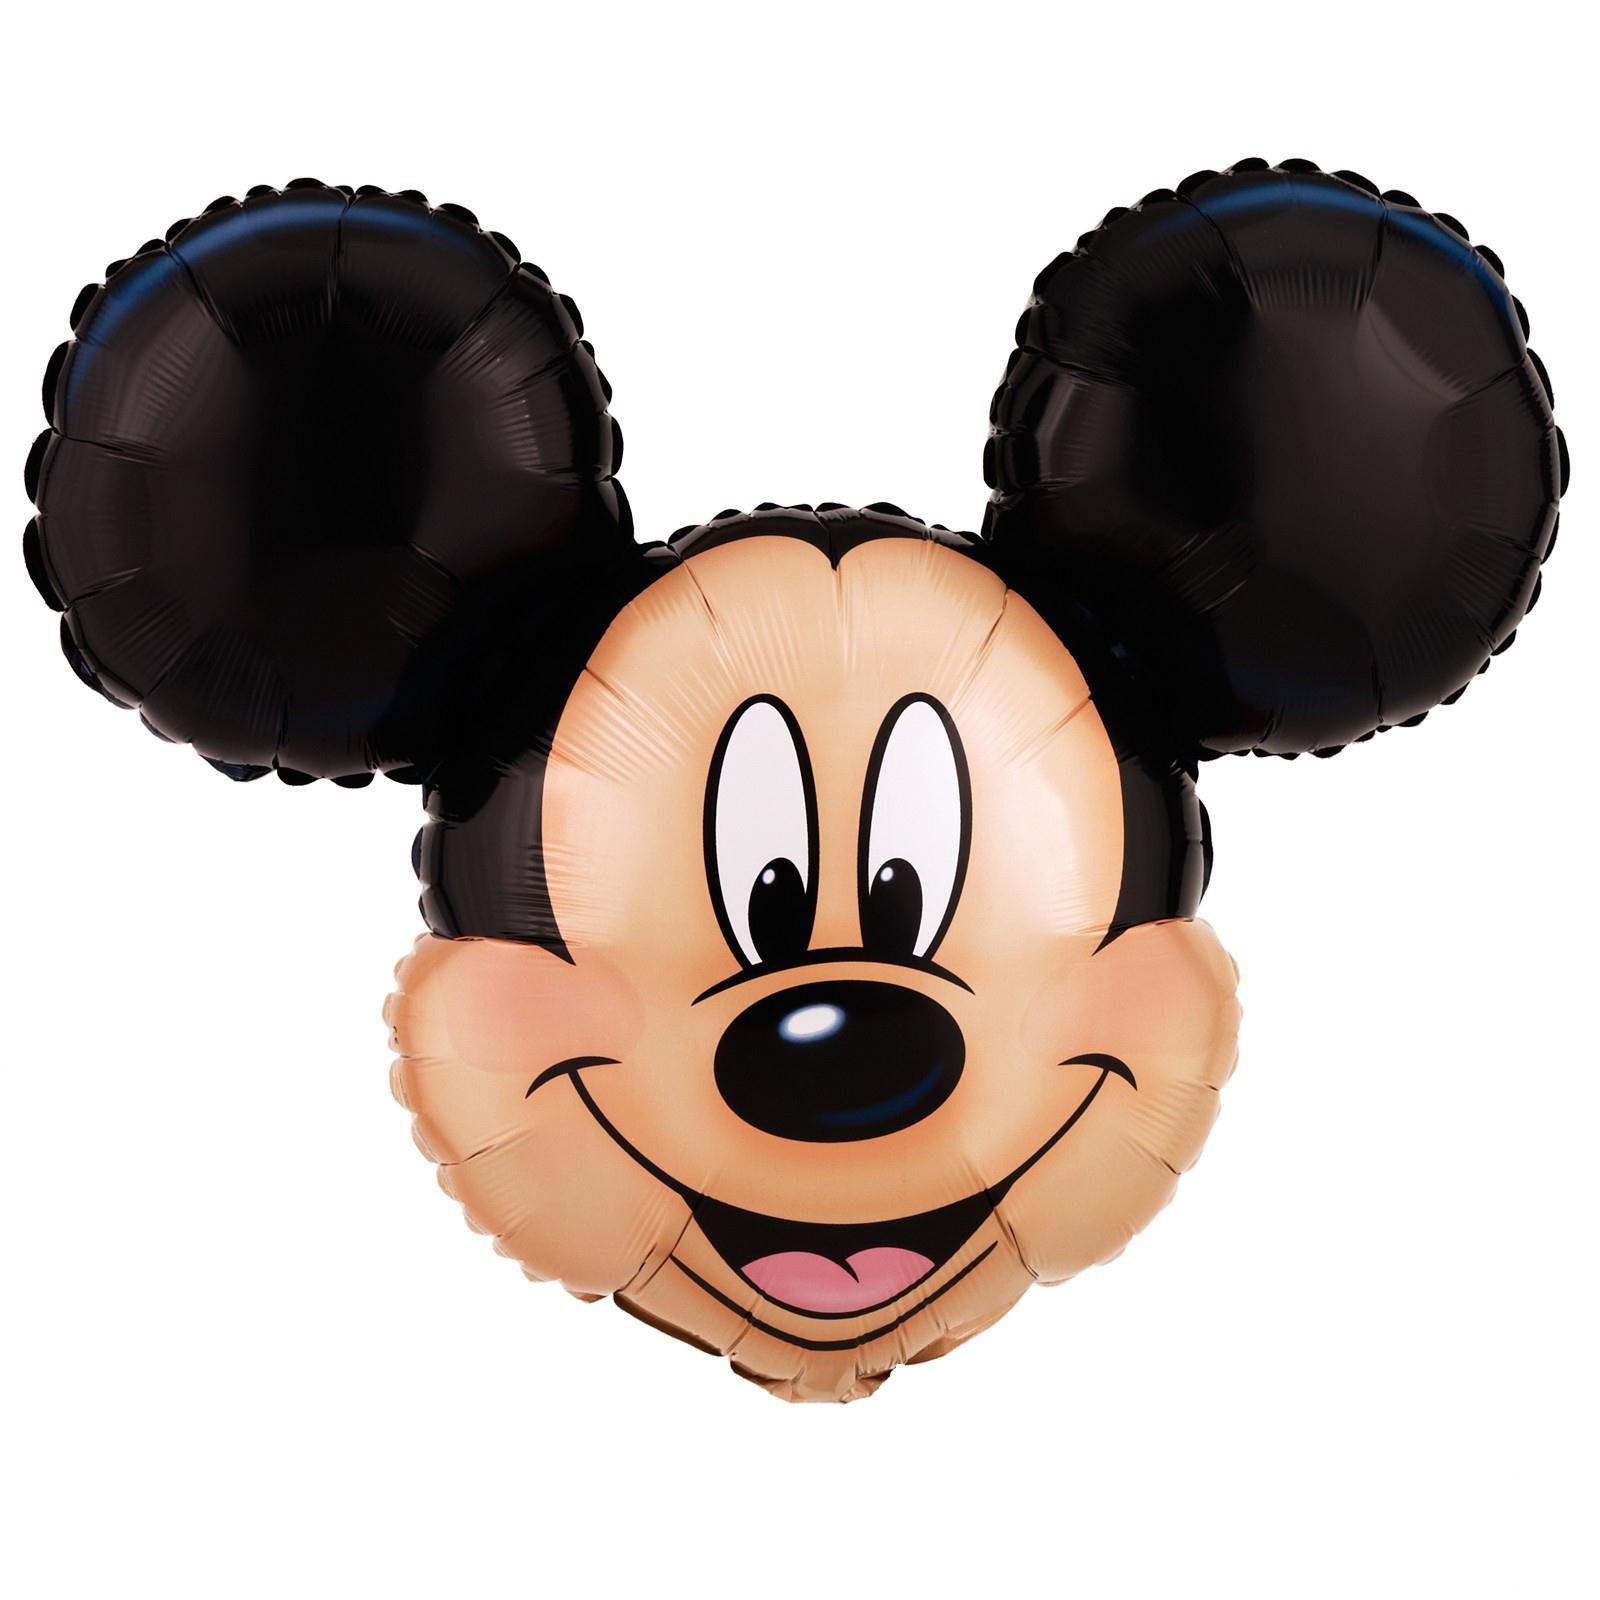 "ANAGRAM XL 27"" Disney Mickey Mouse Super Shape Mylar Foil Birthday Party Balloon at Sears.com"